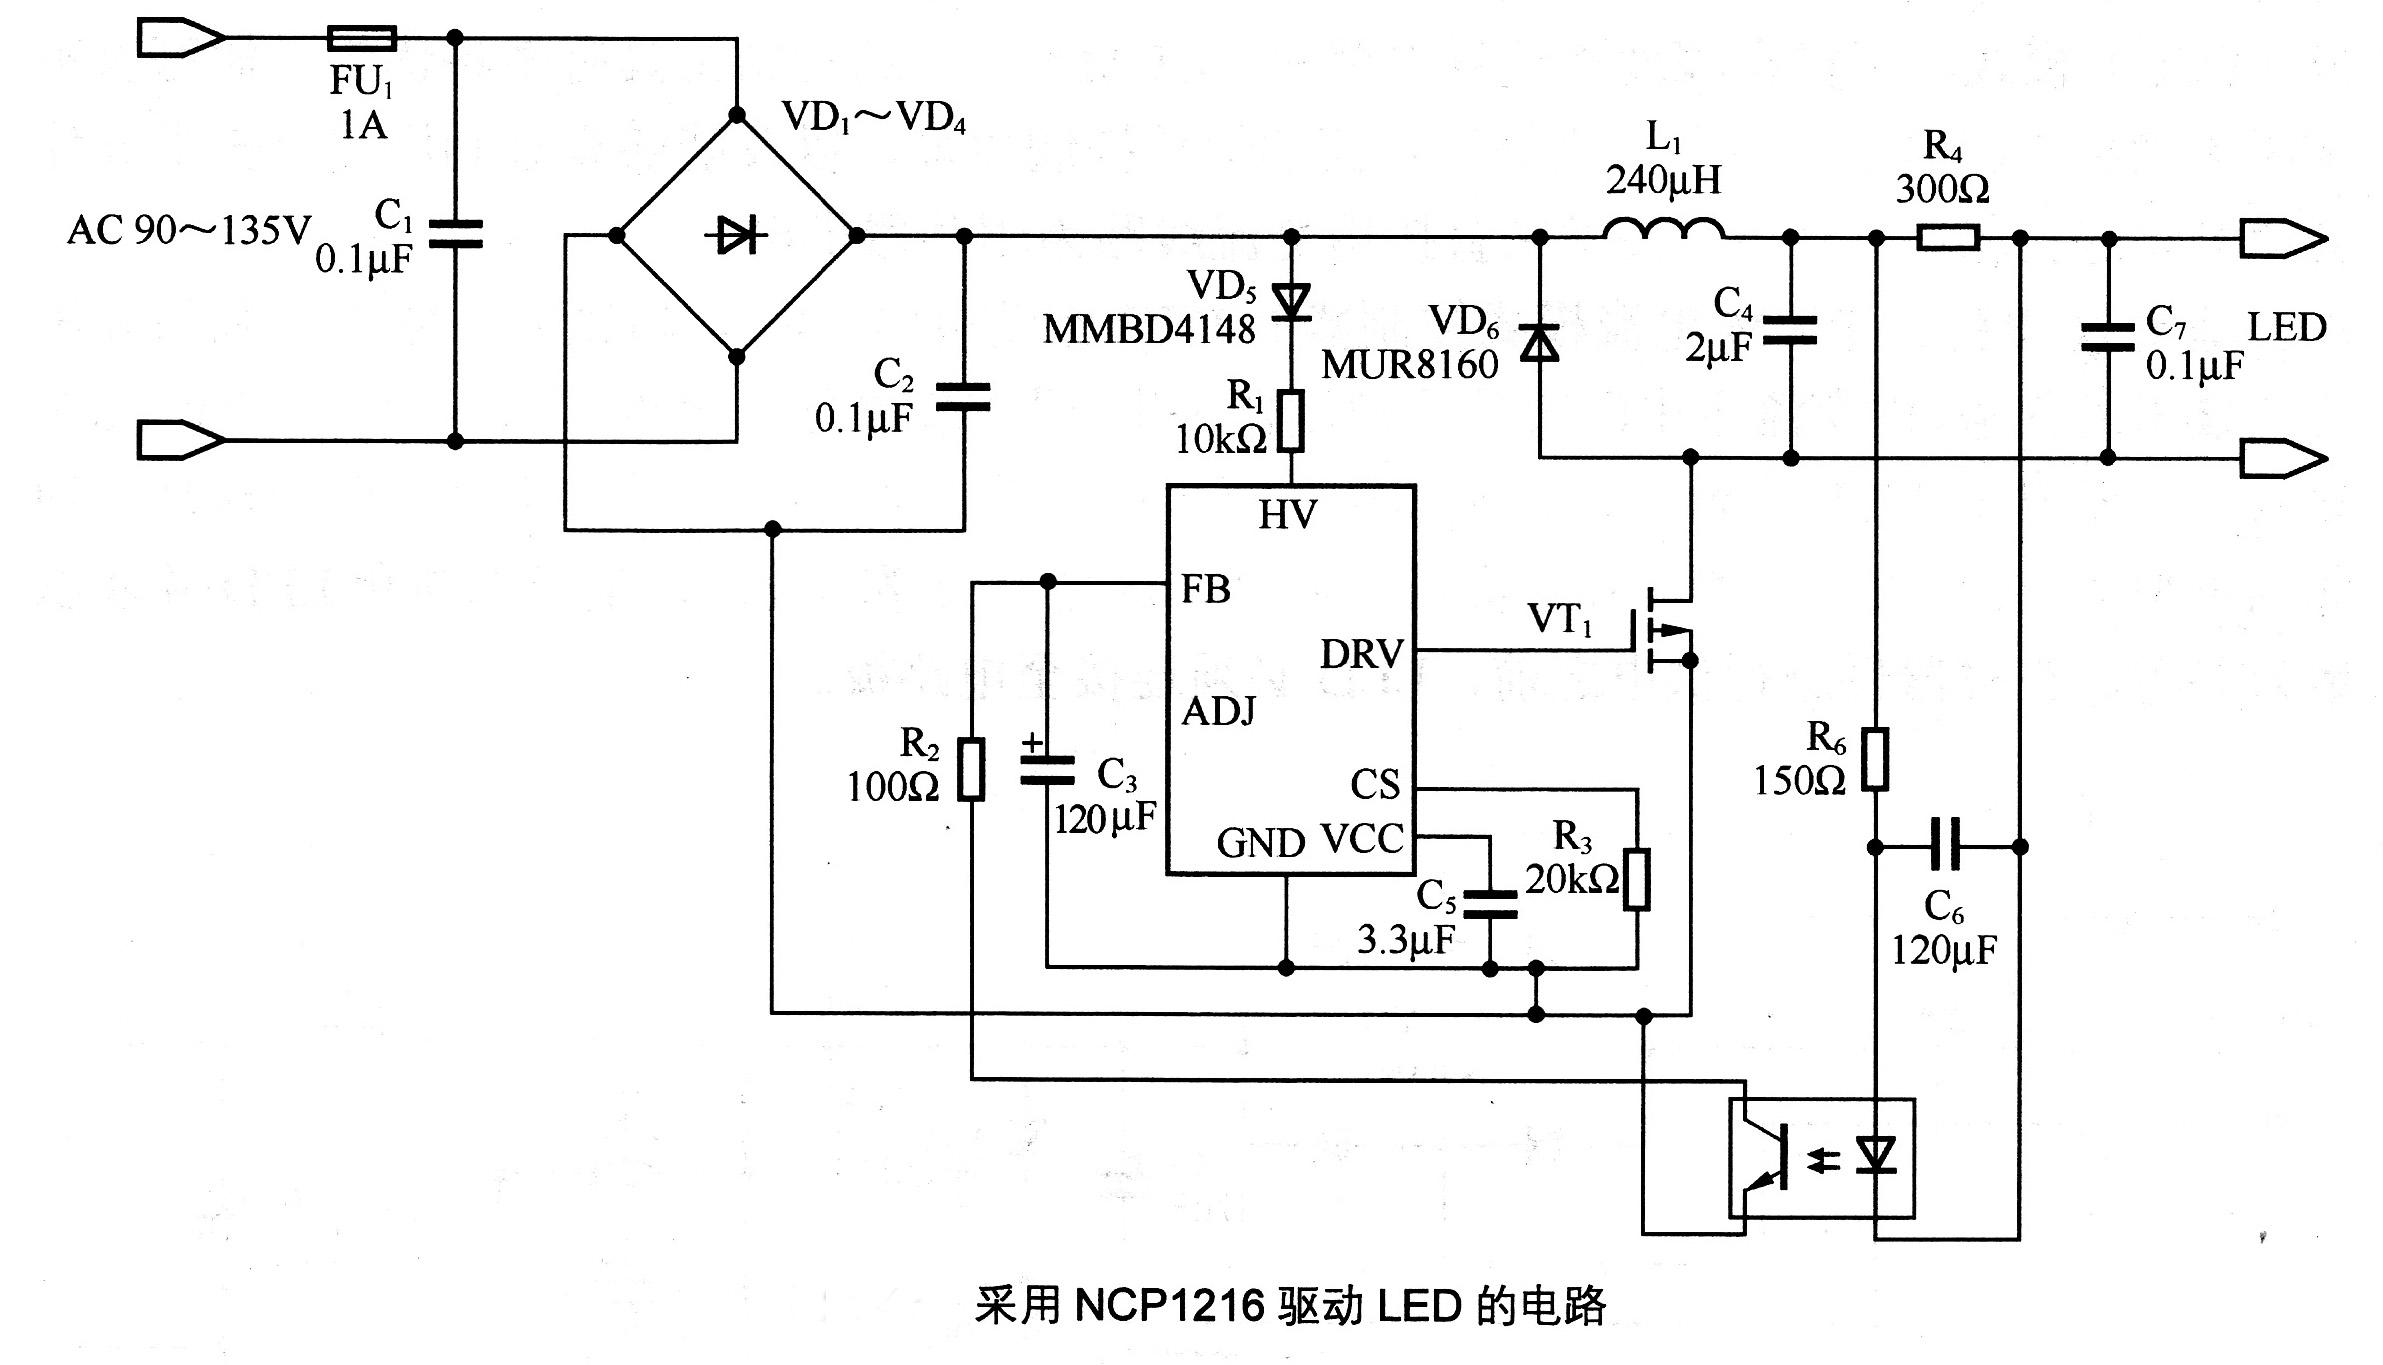 采用NCP1216驱动LED的电路